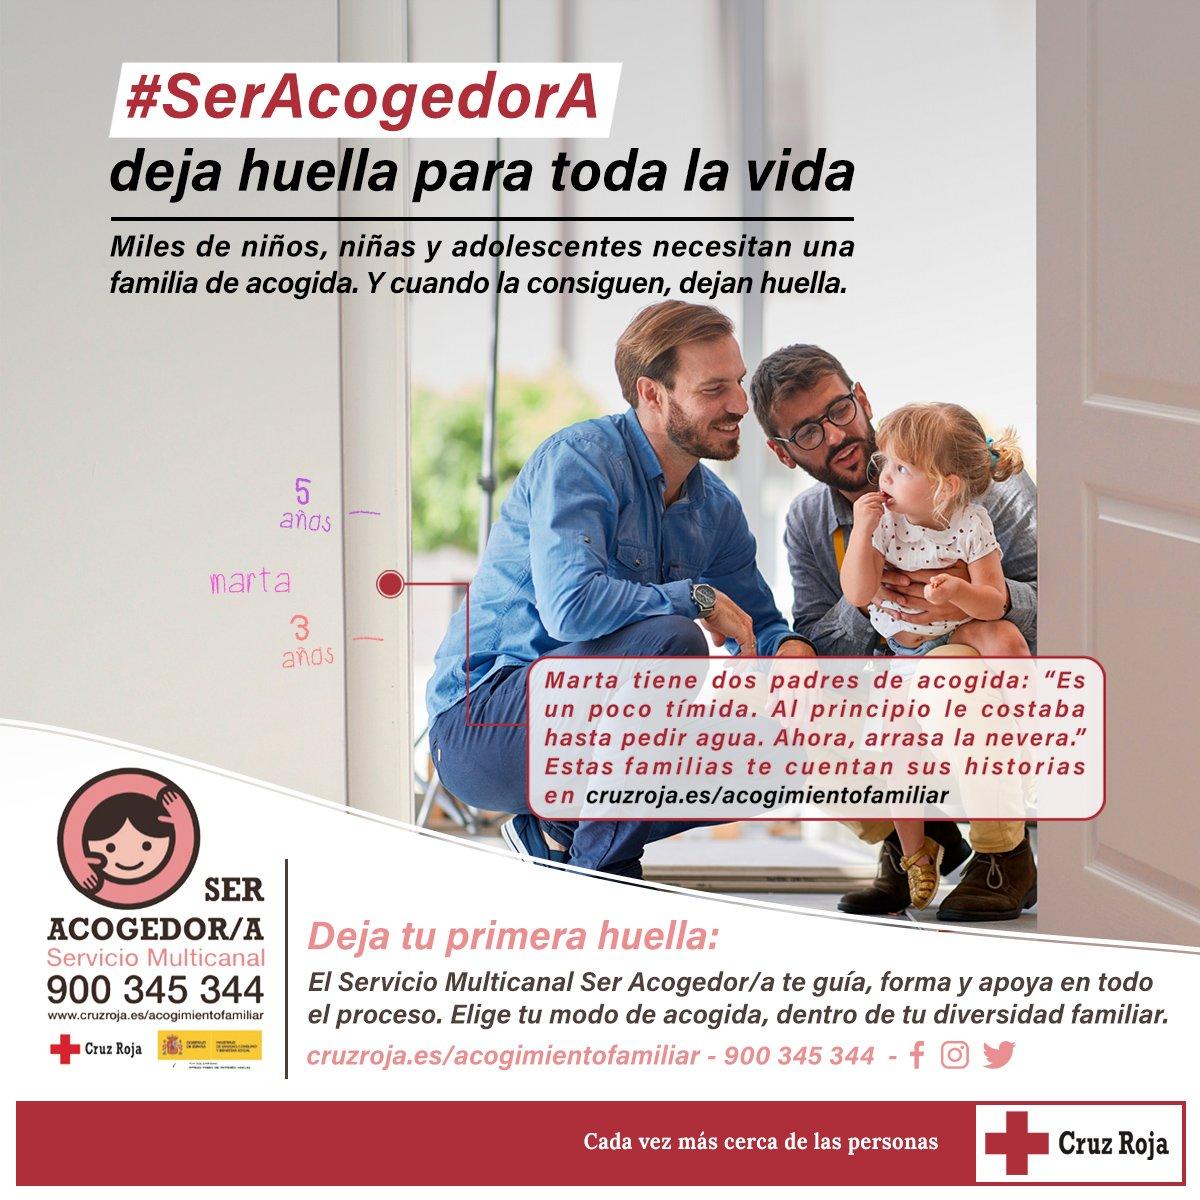 cruz roja-ser-acogedora-agencia-nanook-estrategia-digital